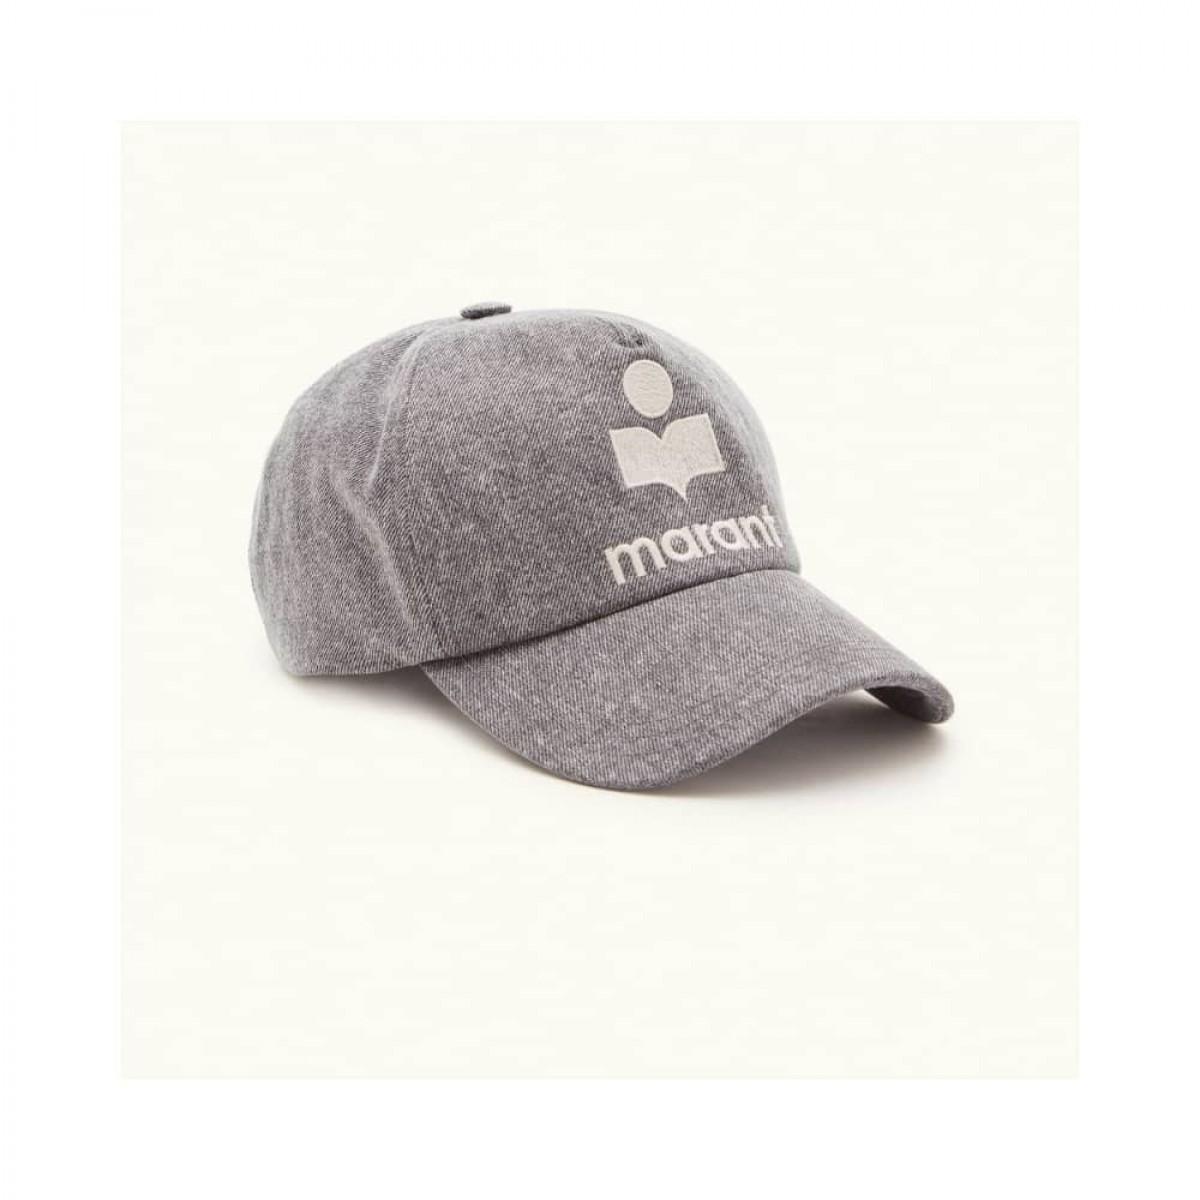 tyron cap - grey